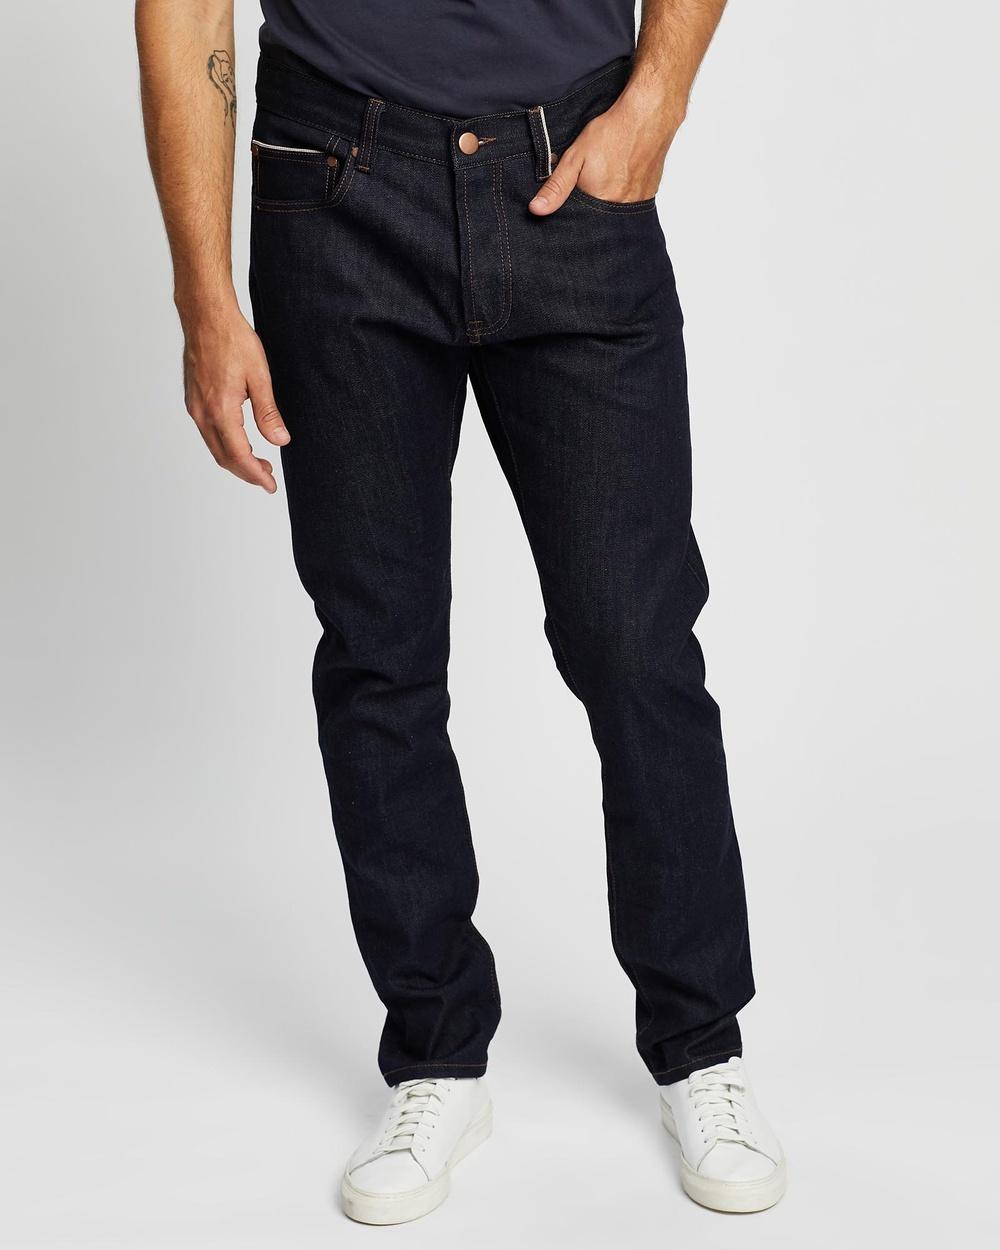 3 Wise Men Selvedge Denim Jeans Slim Dark Blue